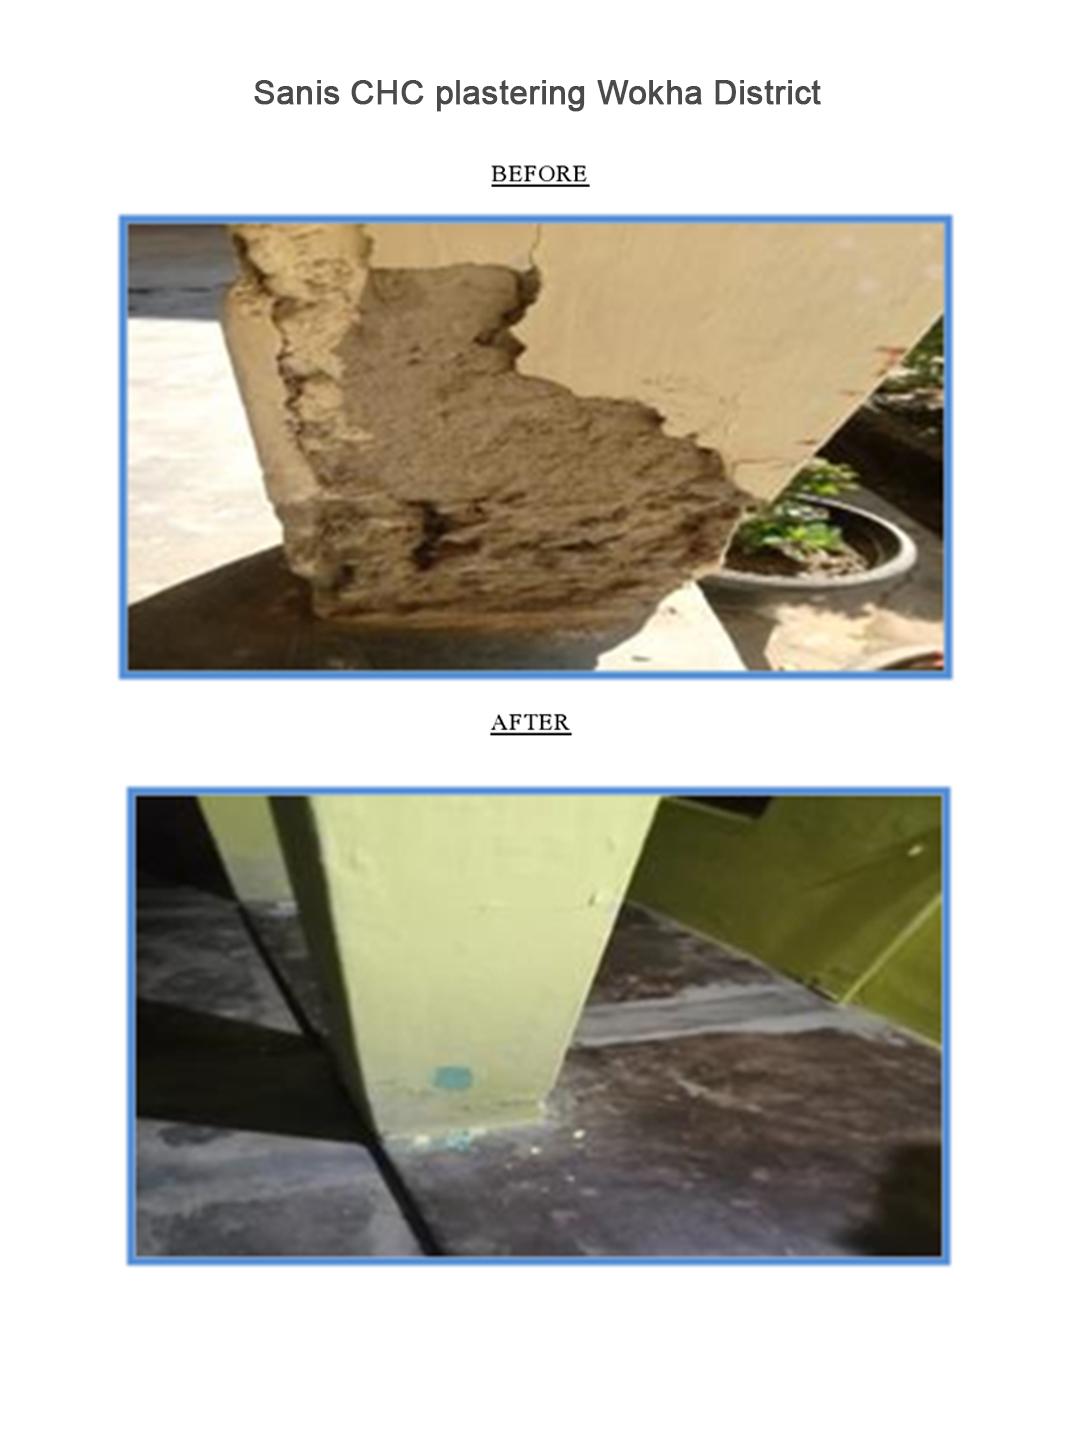 Sanis-CHC-plastering-Wokha-District